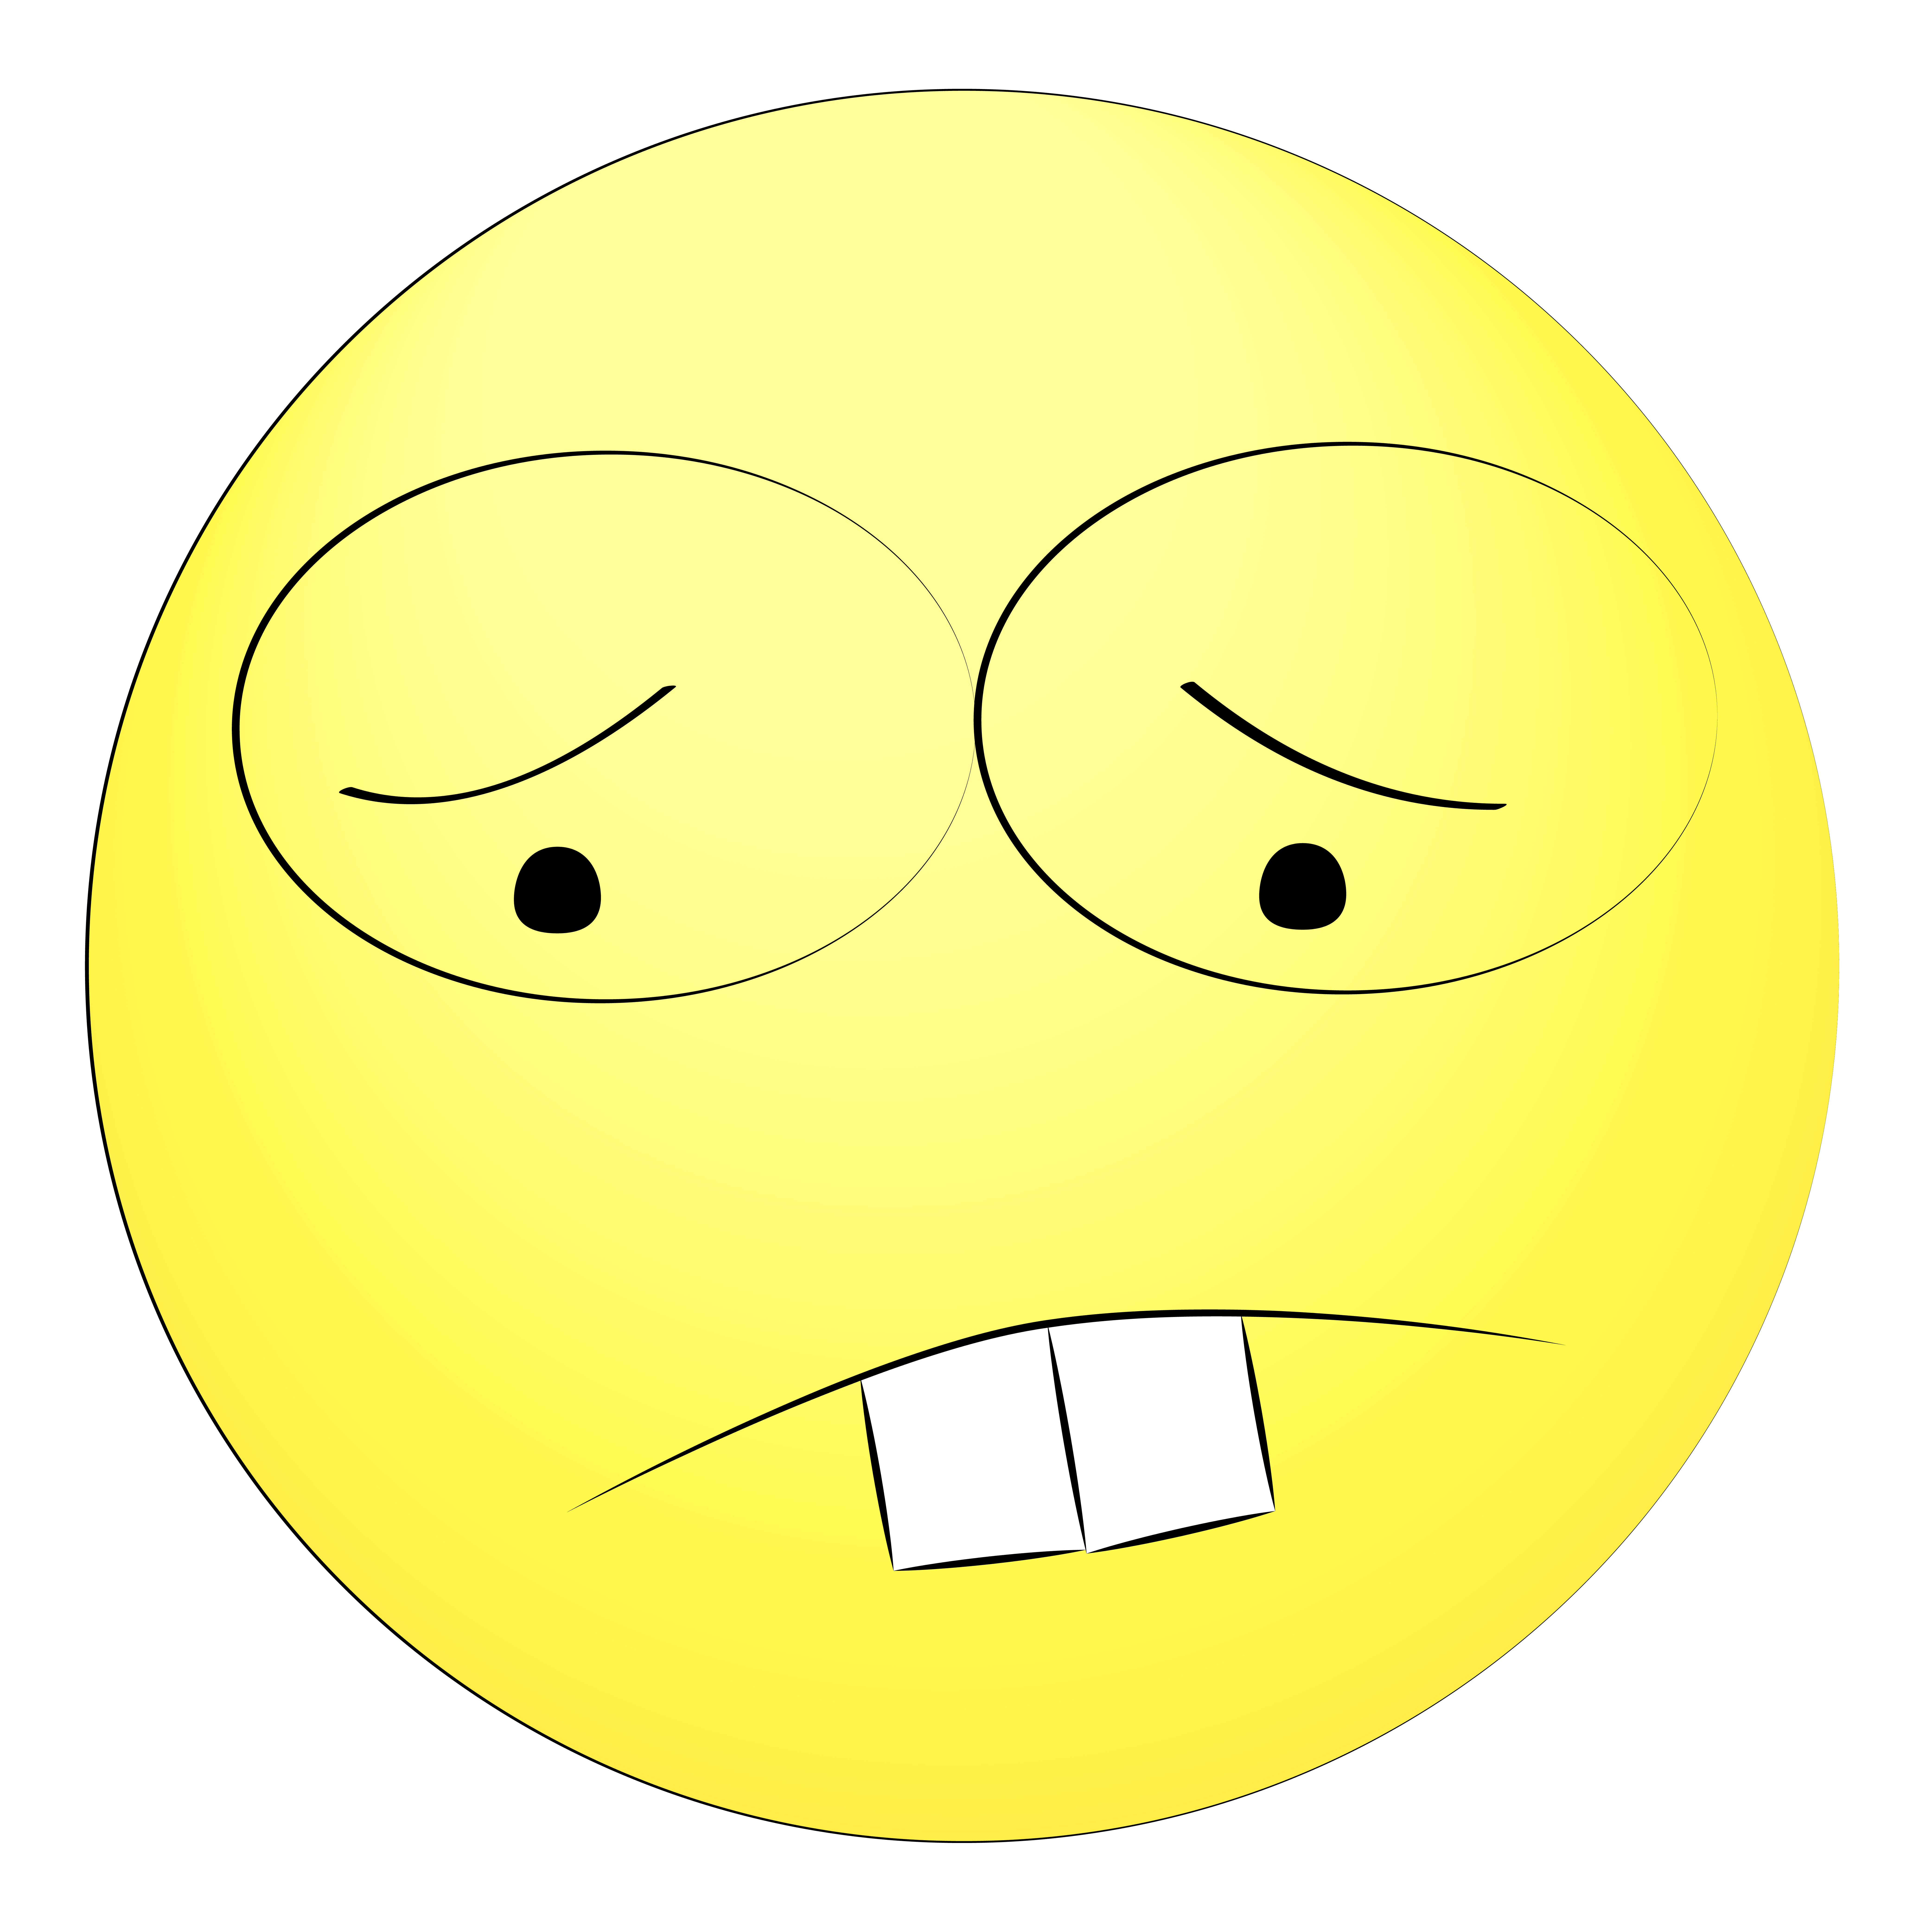 Sad Smiley Face, Yellow, Badge, White, Sphere, HQ Photo